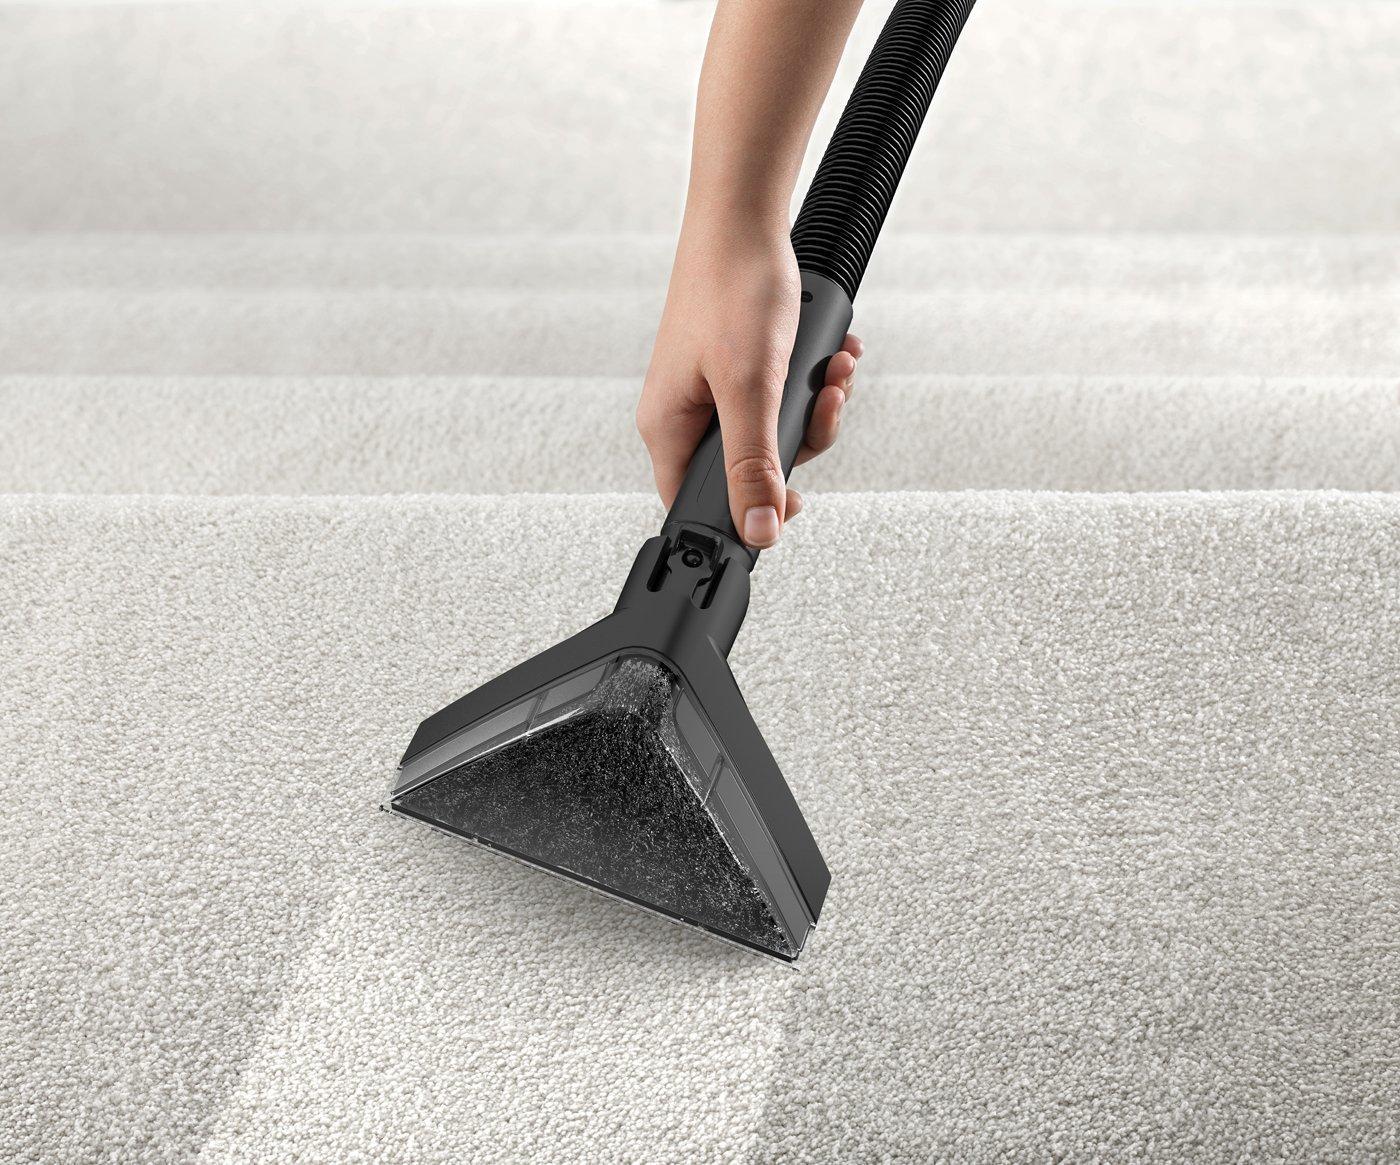 Turbo Scrub Carpet Cleaner5